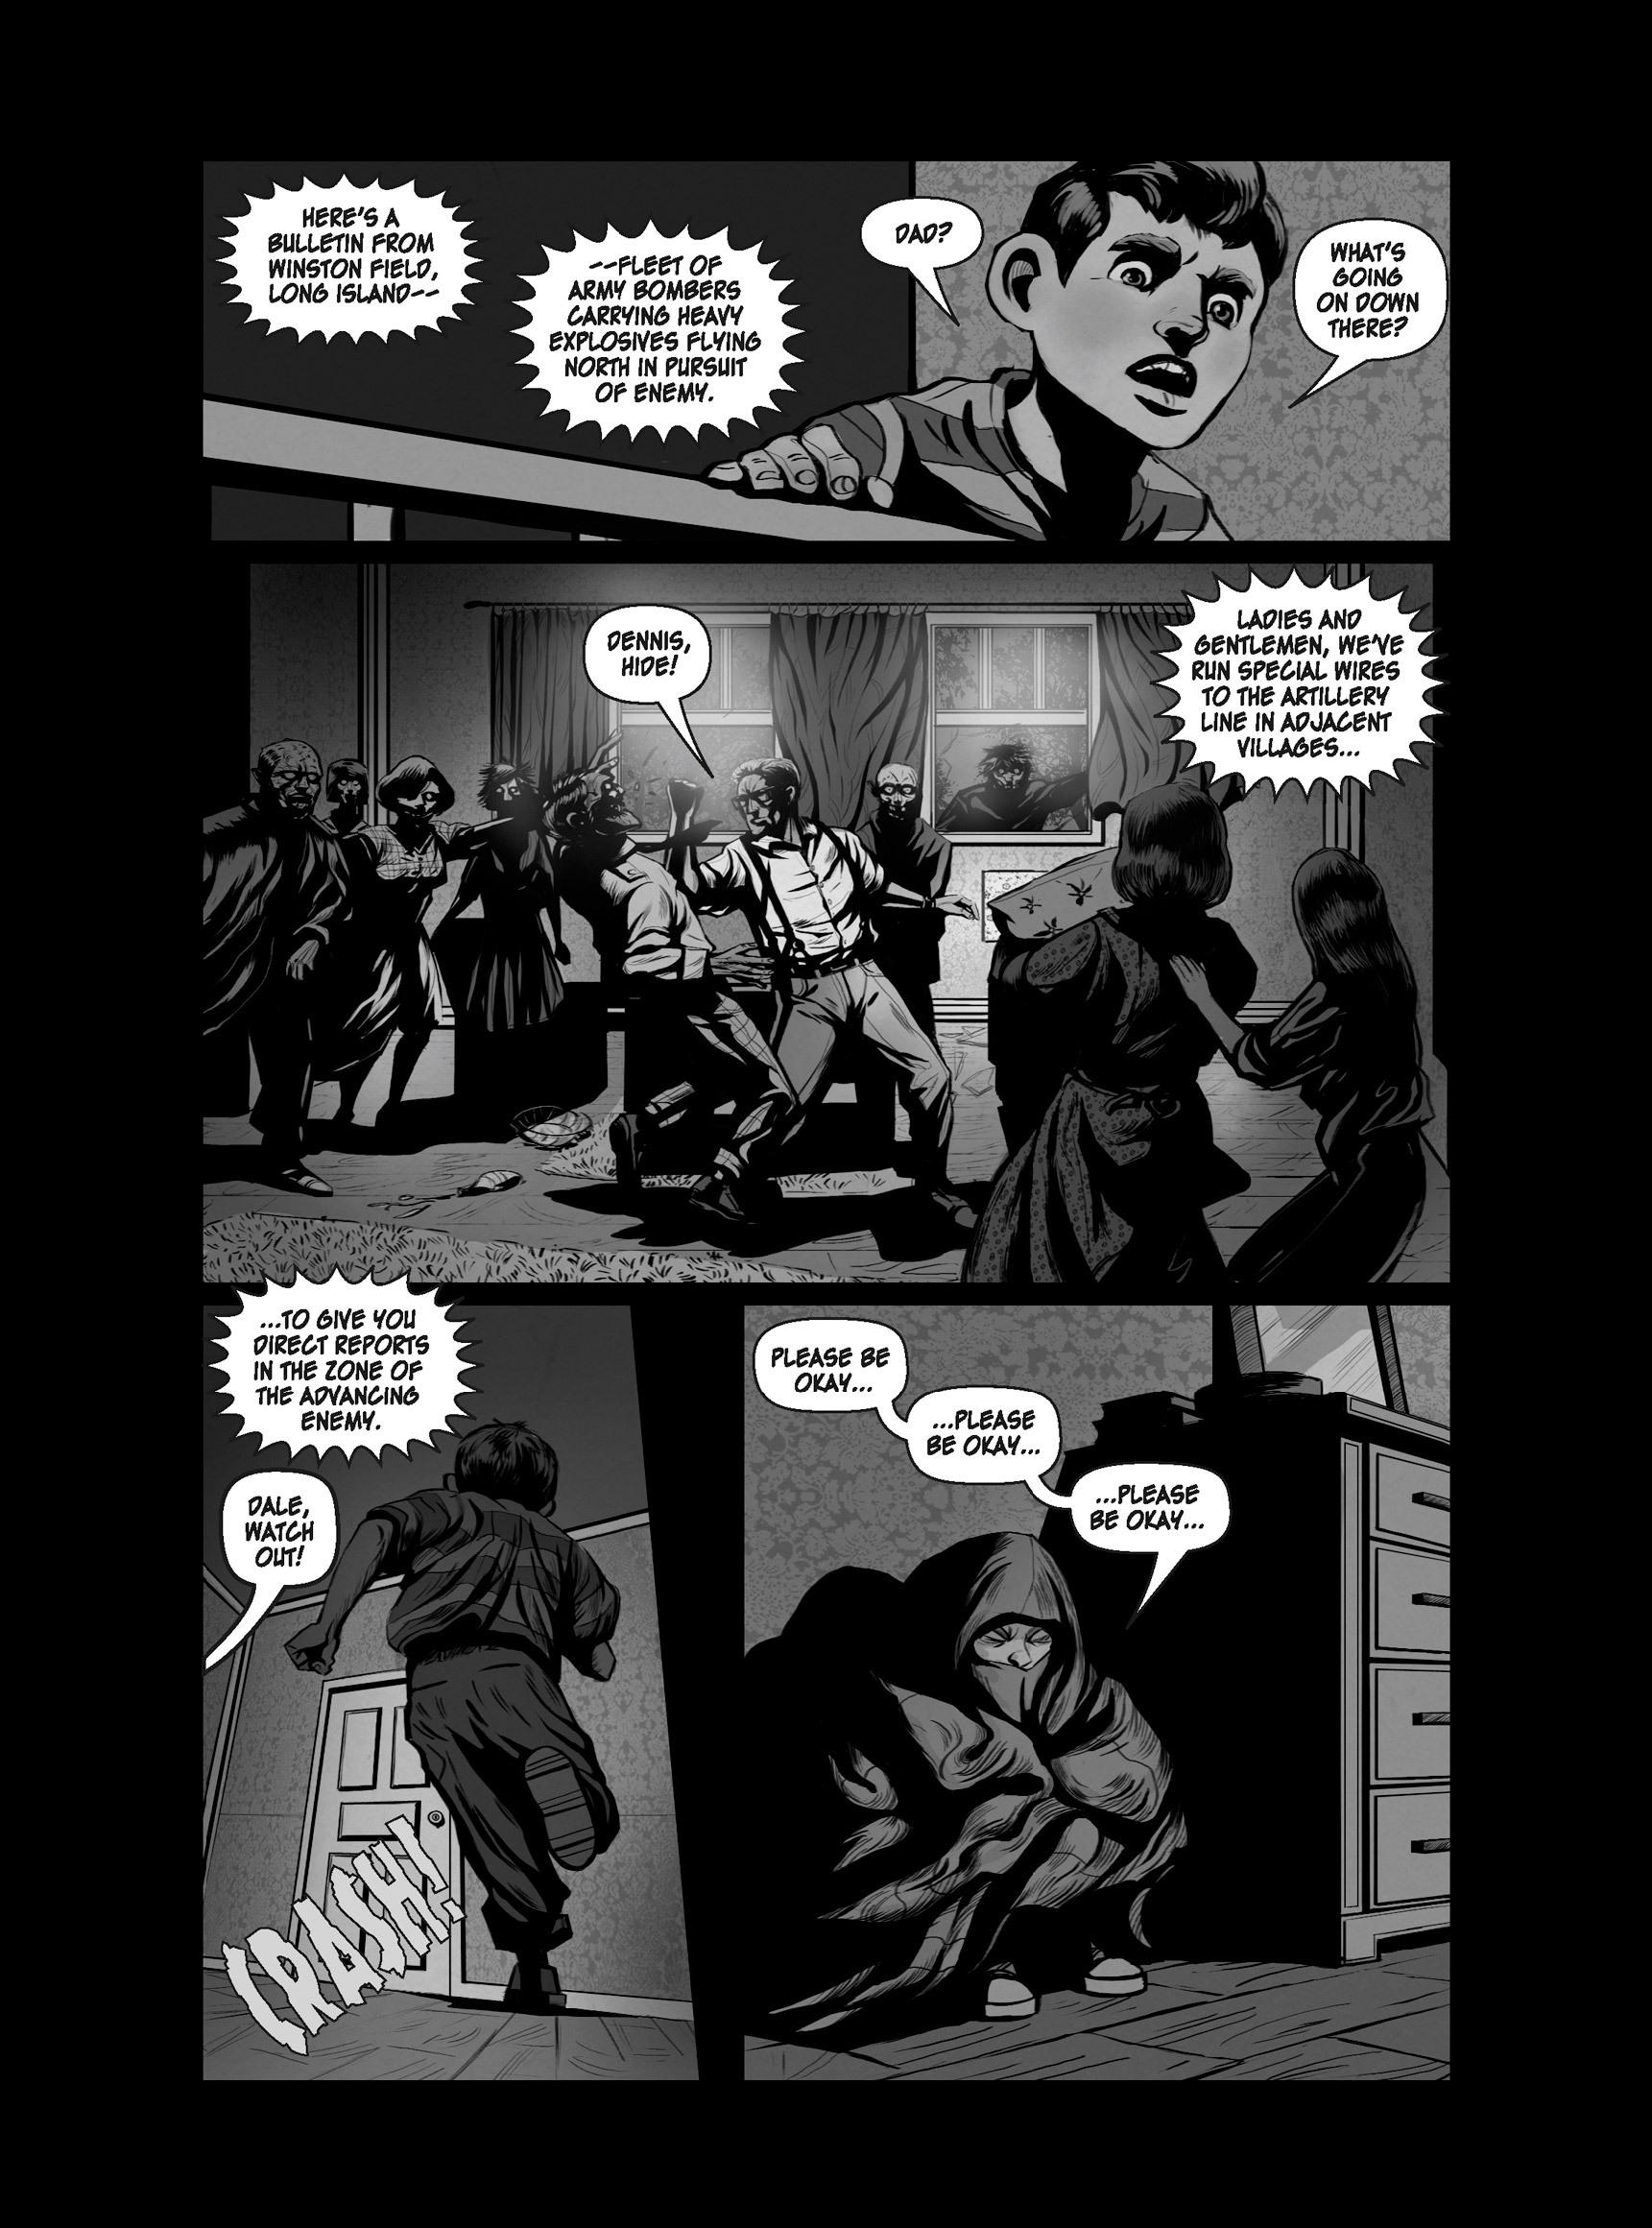 Read online FUBAR comic -  Issue #3 - 258